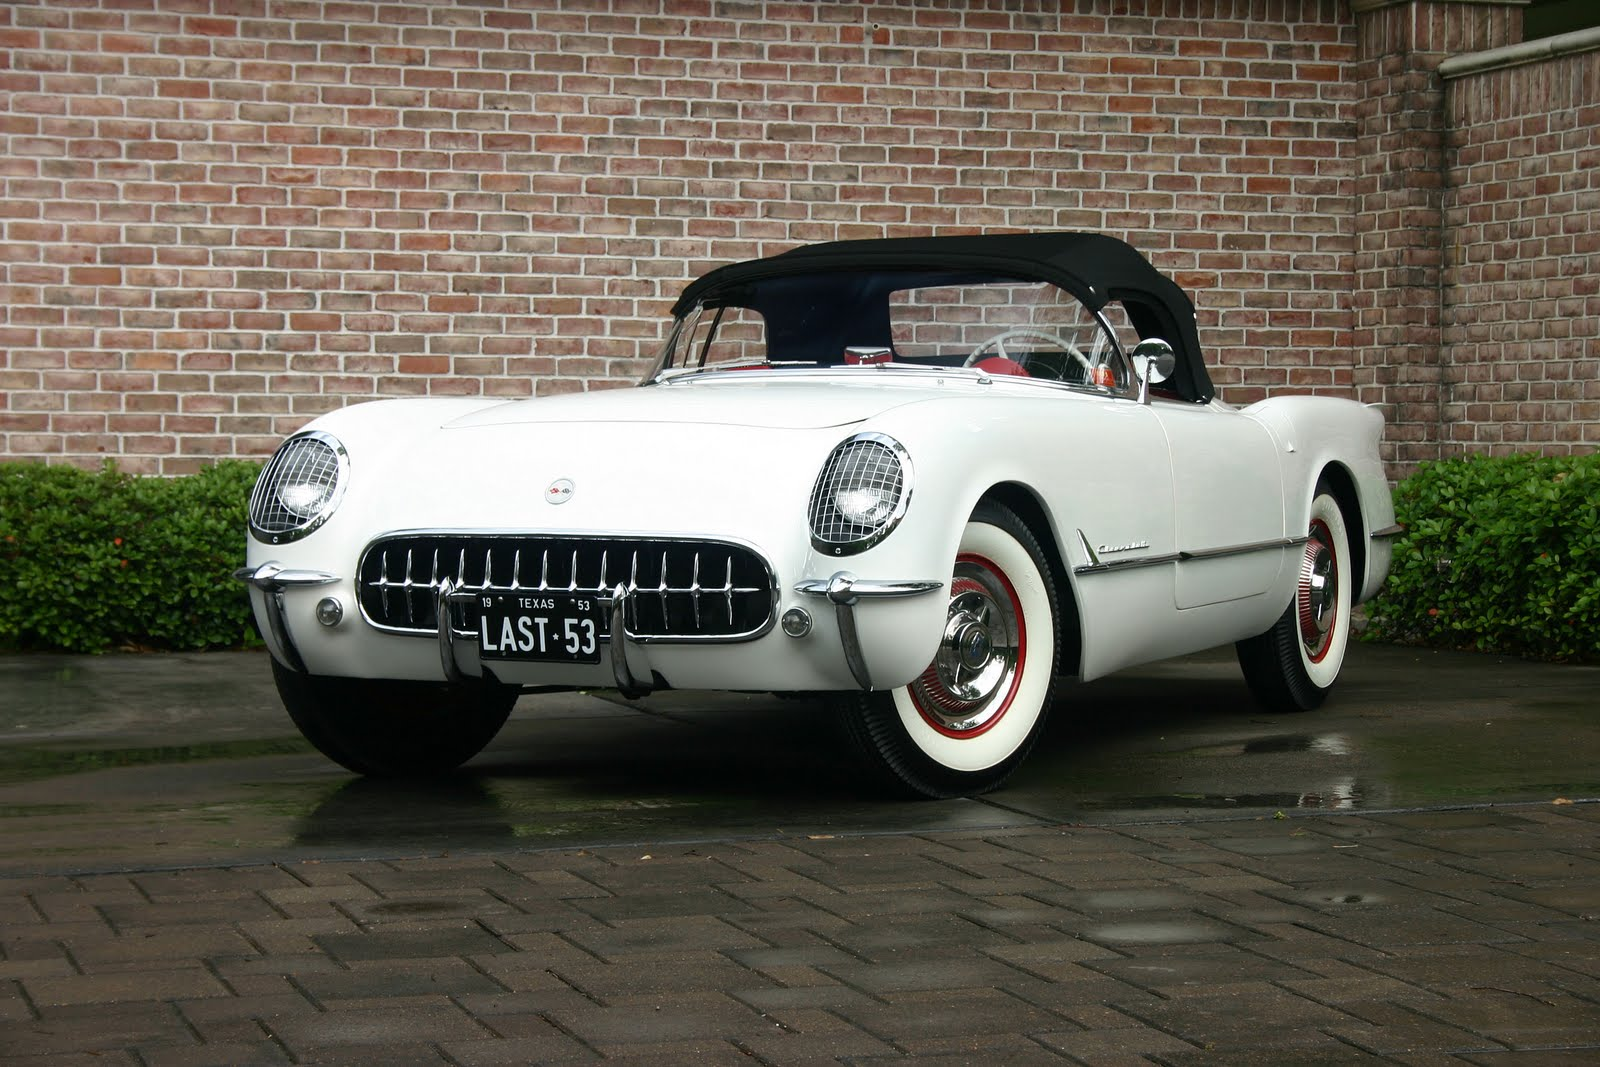 Corvettes Of Houston >> The Corvette Blog: E53F 001300 - The Last of the First ...